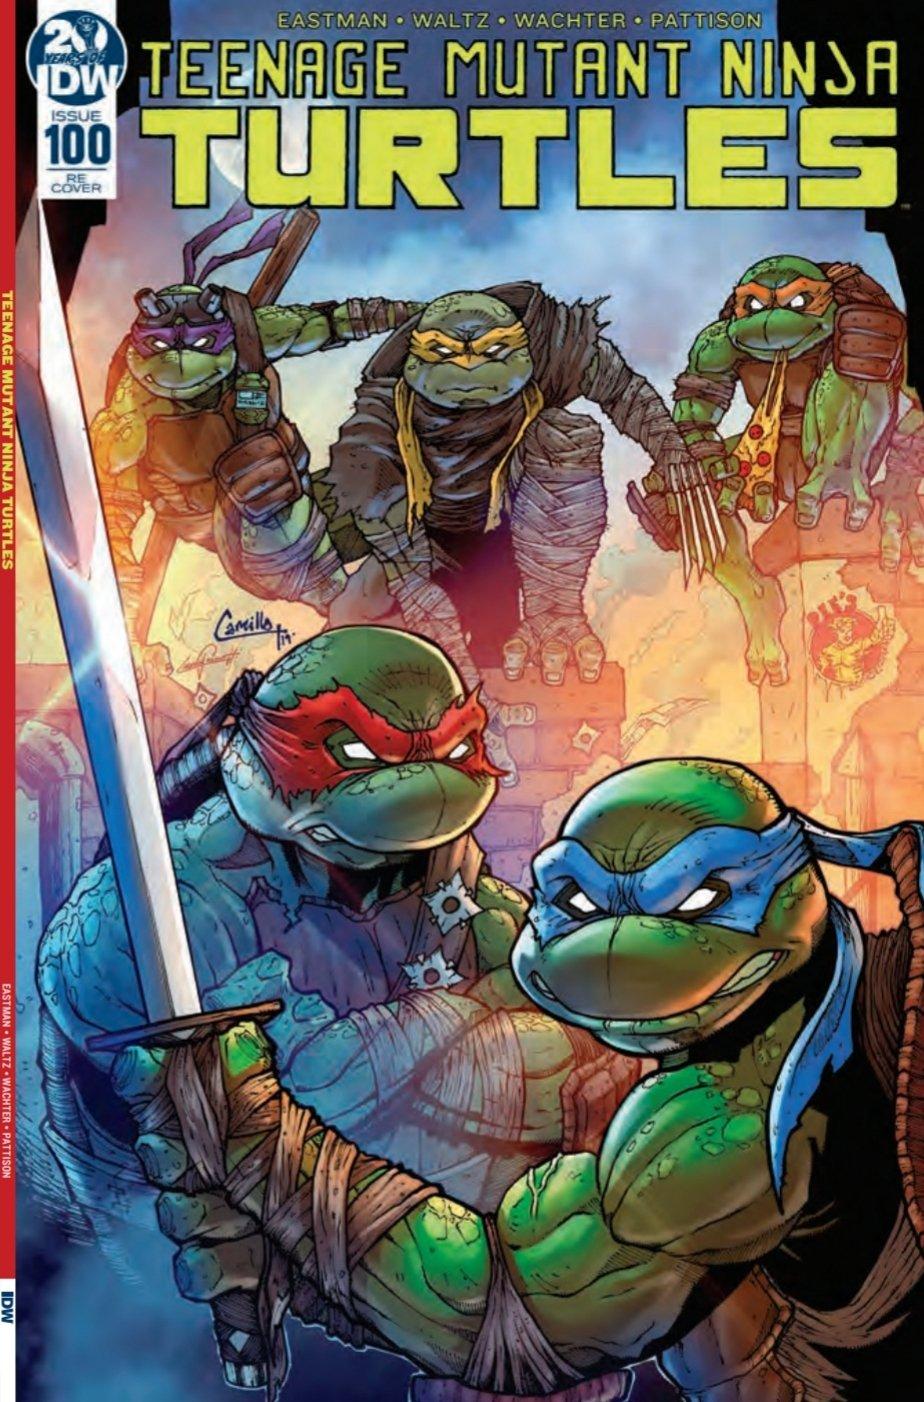 Image of TMNT issue 100 dee's comics retailer exclusive variant